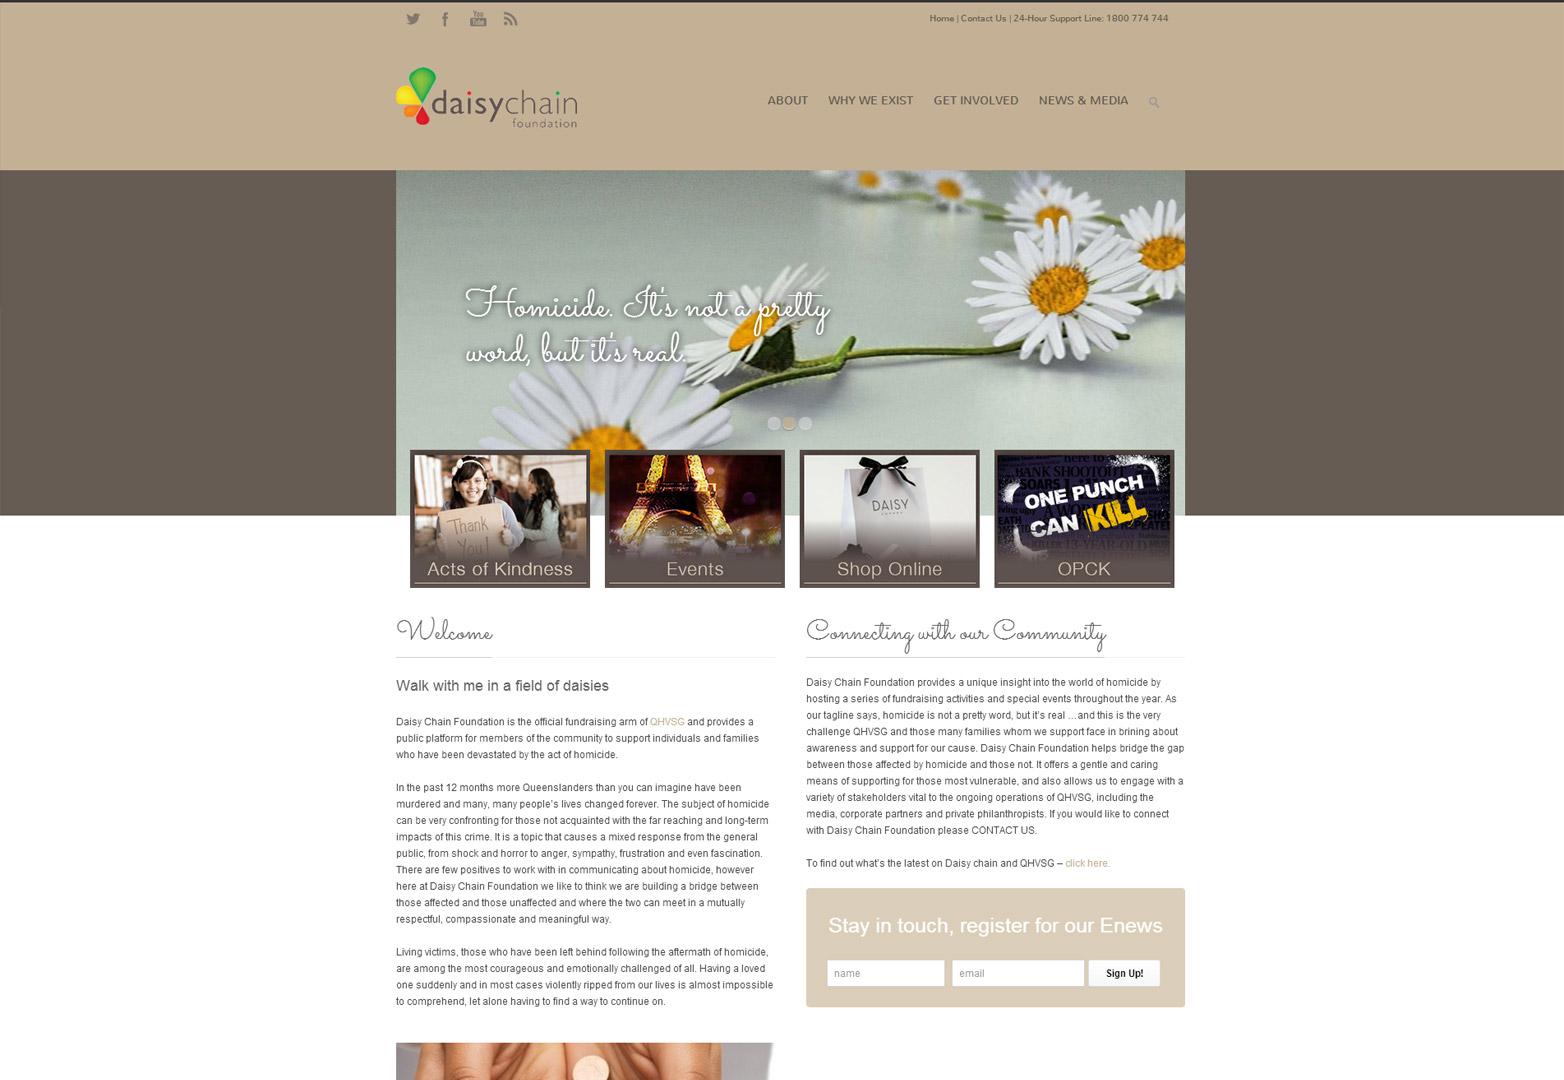 webdesign_daisychain01